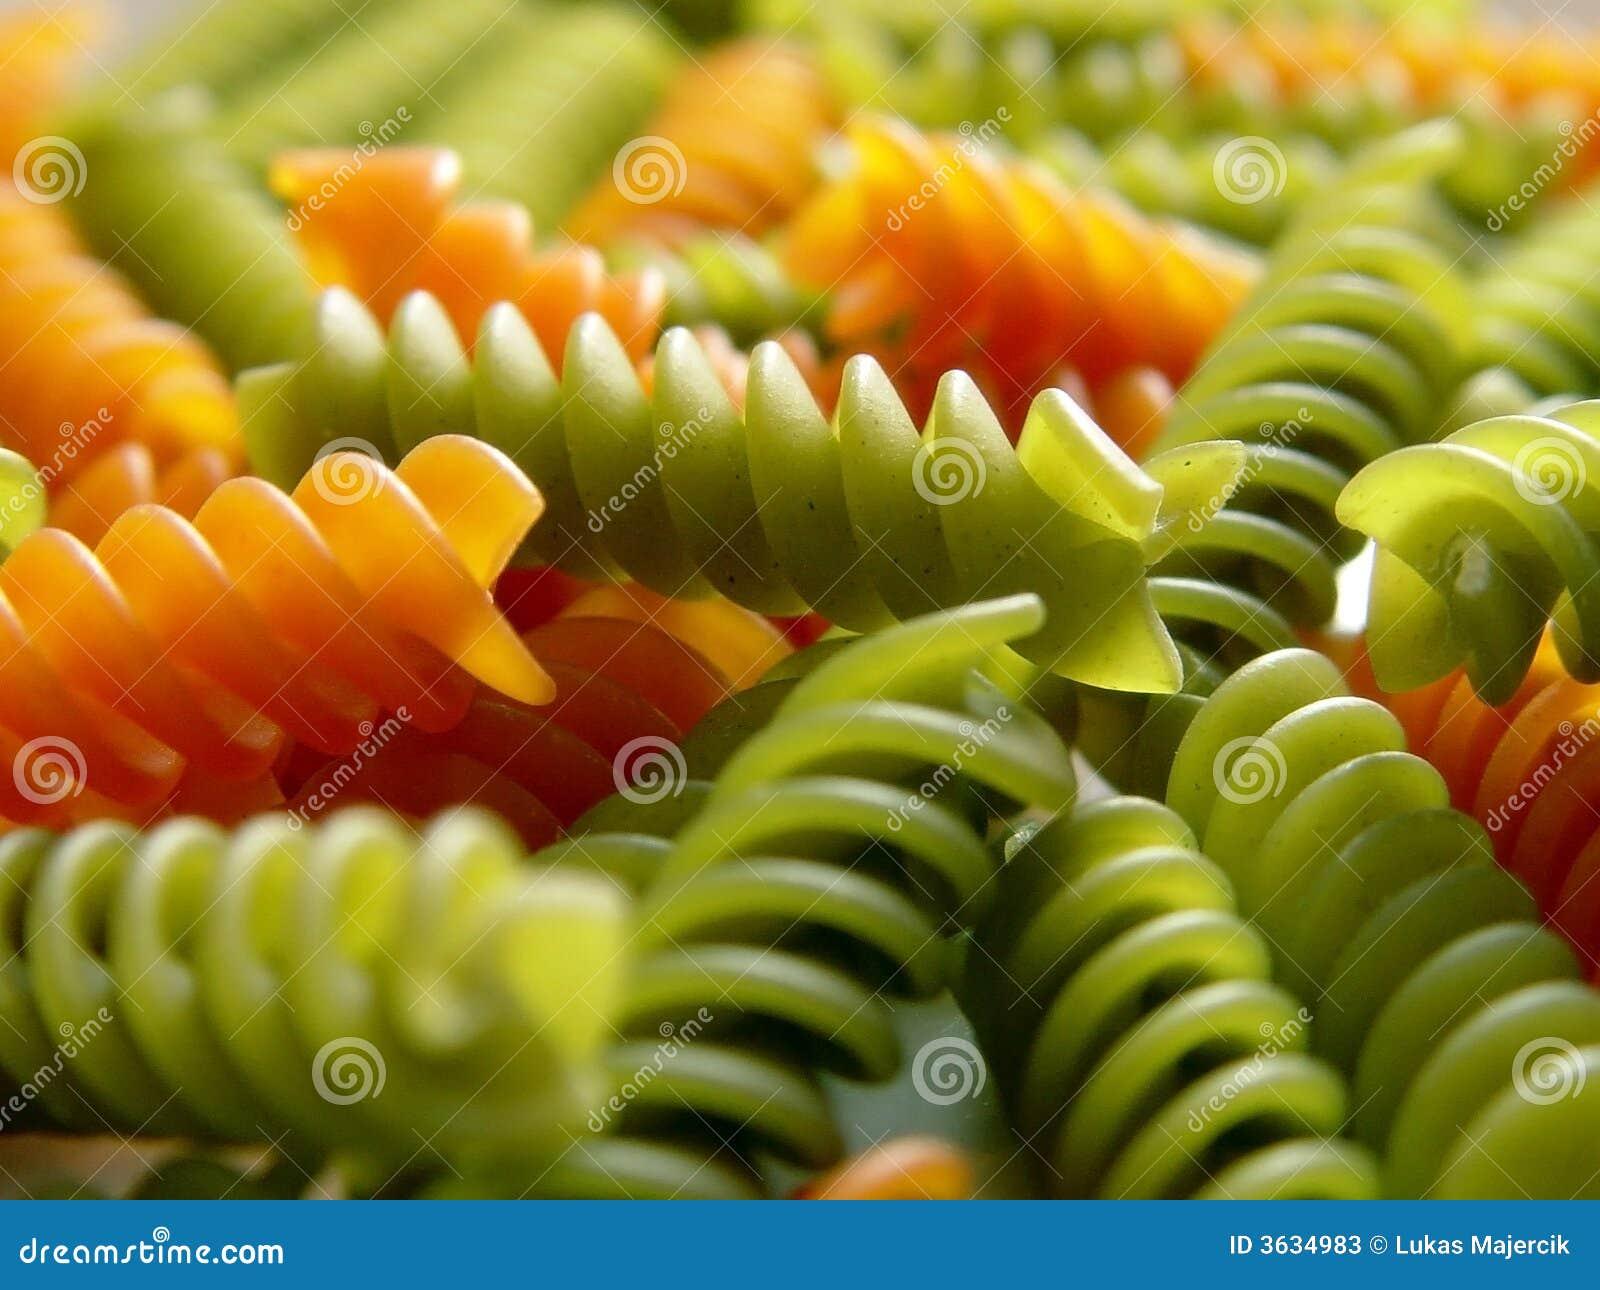 Italian Pasta Fusilli Red And Green 3 Stock Photos Image